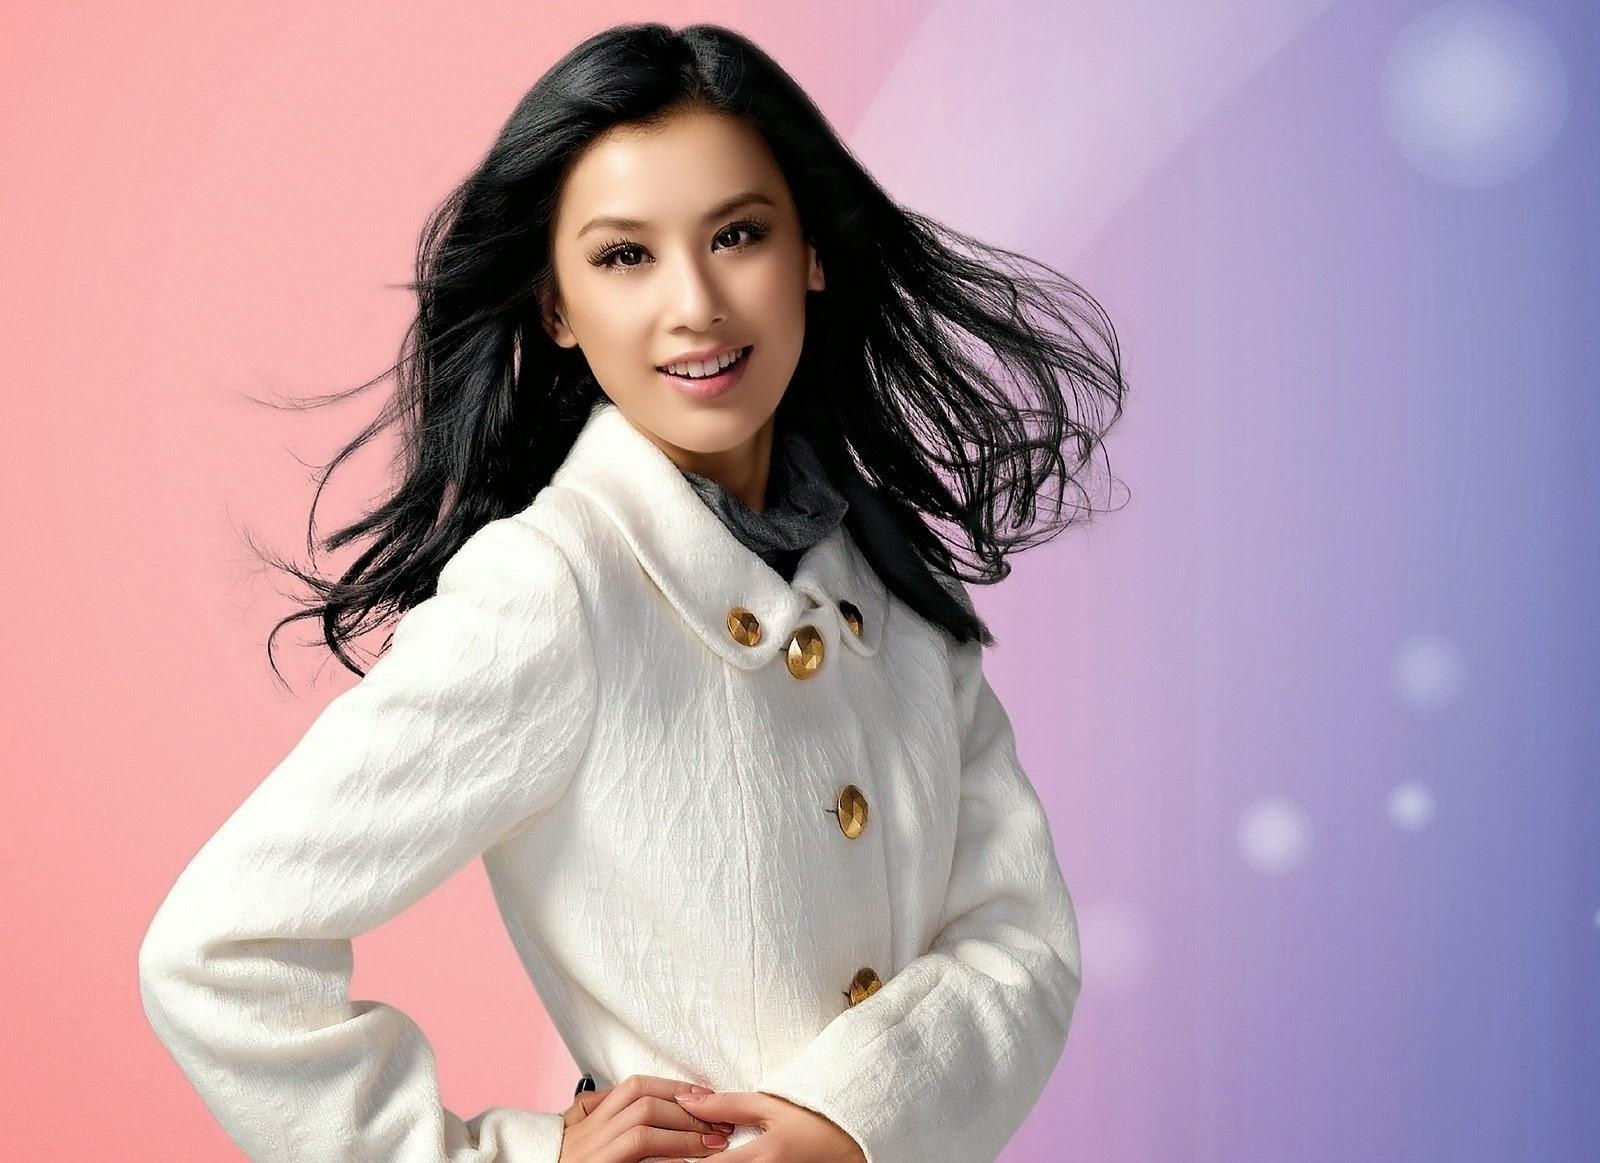 hot girl wallpaper: eva huang hd wallpaper free